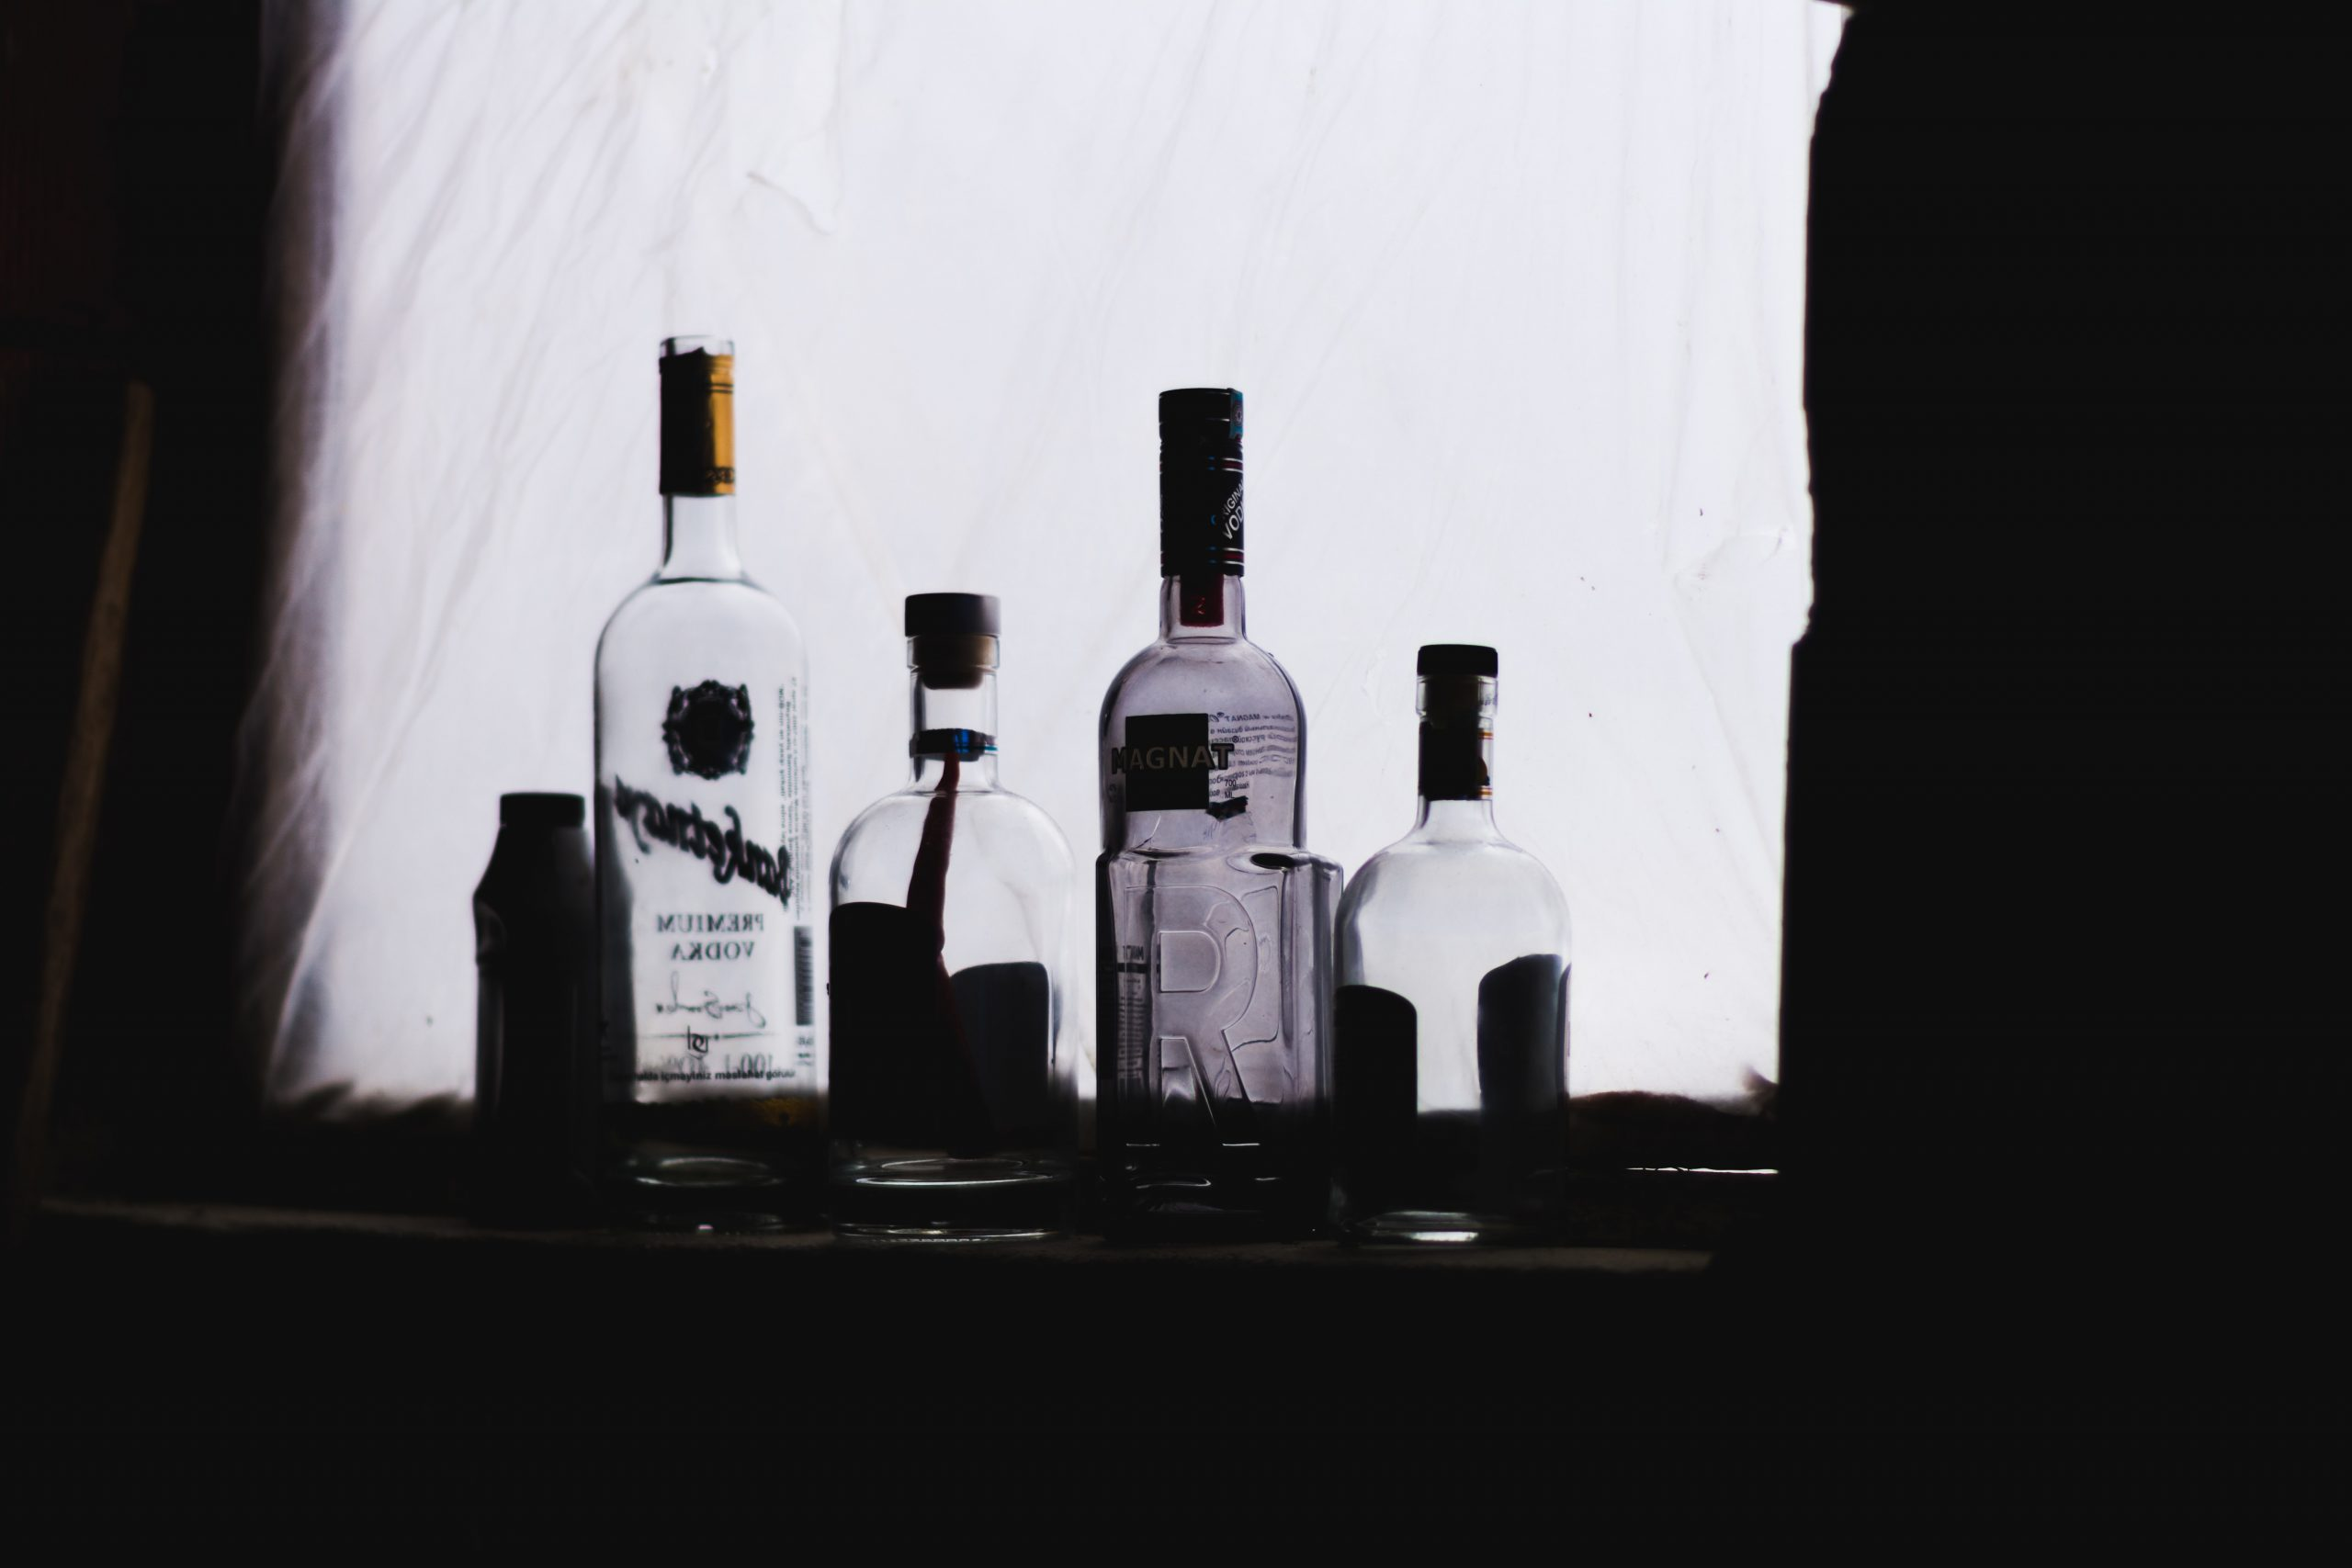 underage drinking and depression